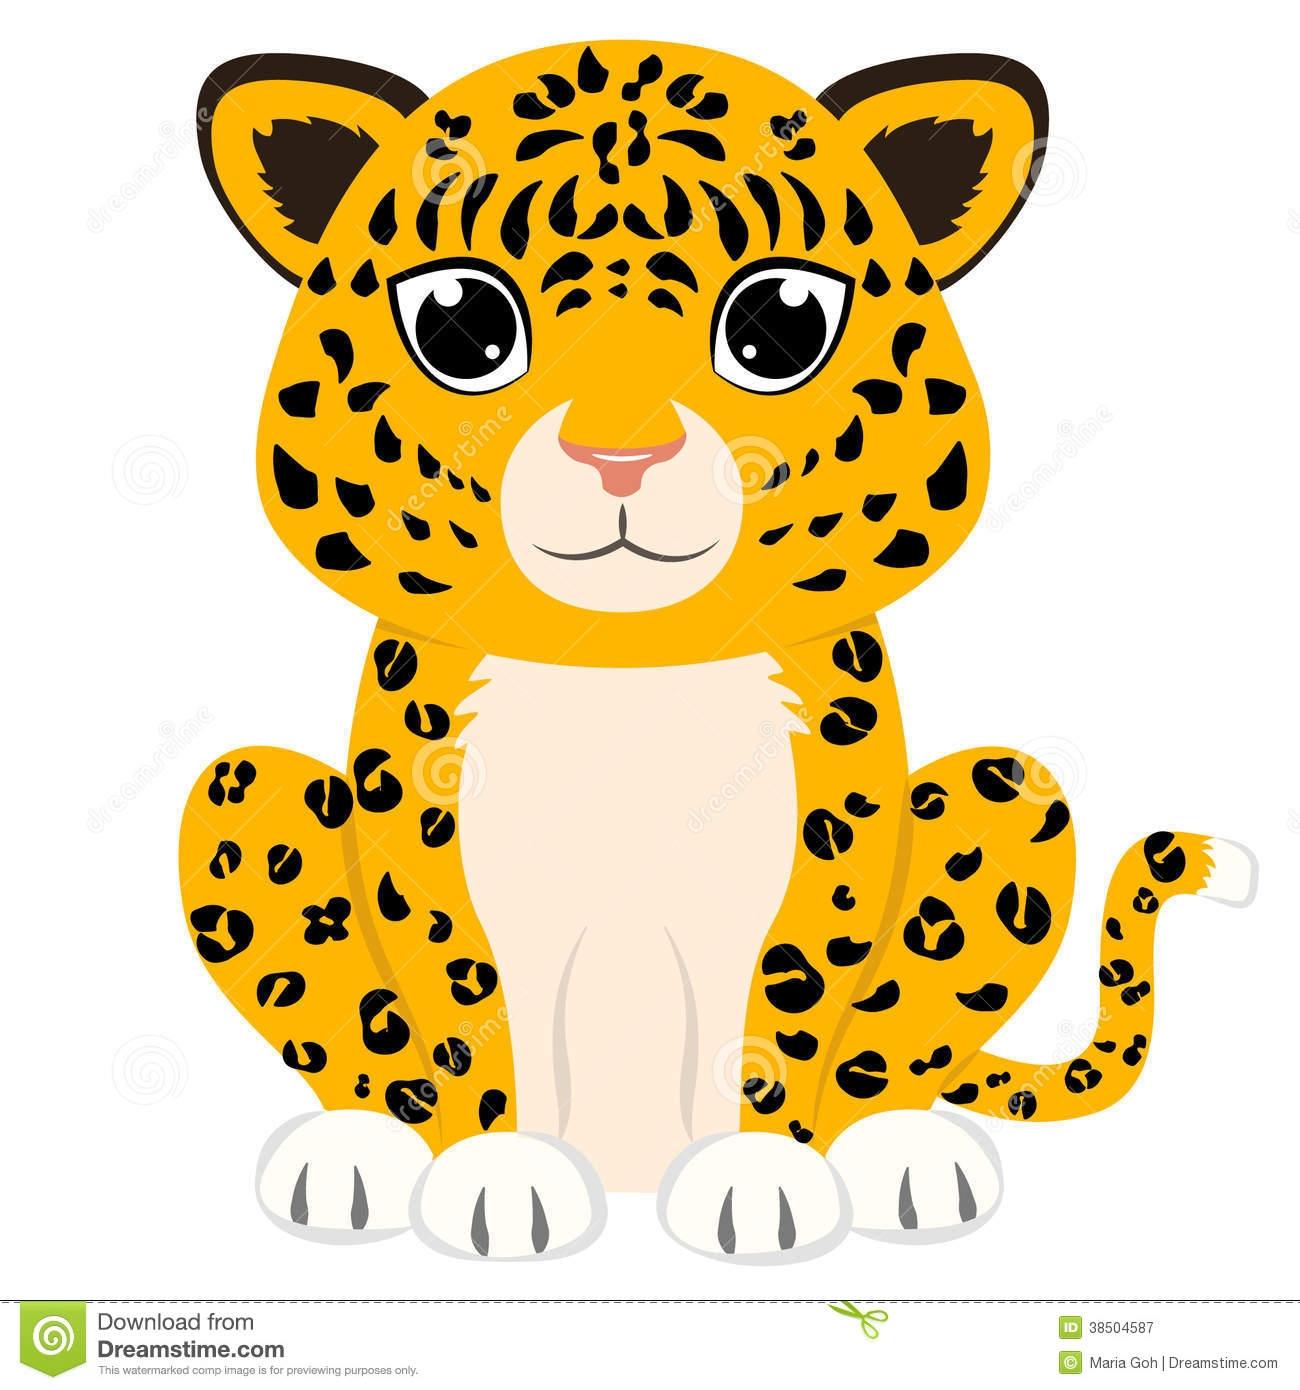 Amur Leopard clipart Leopard com Amur Royalty Stock